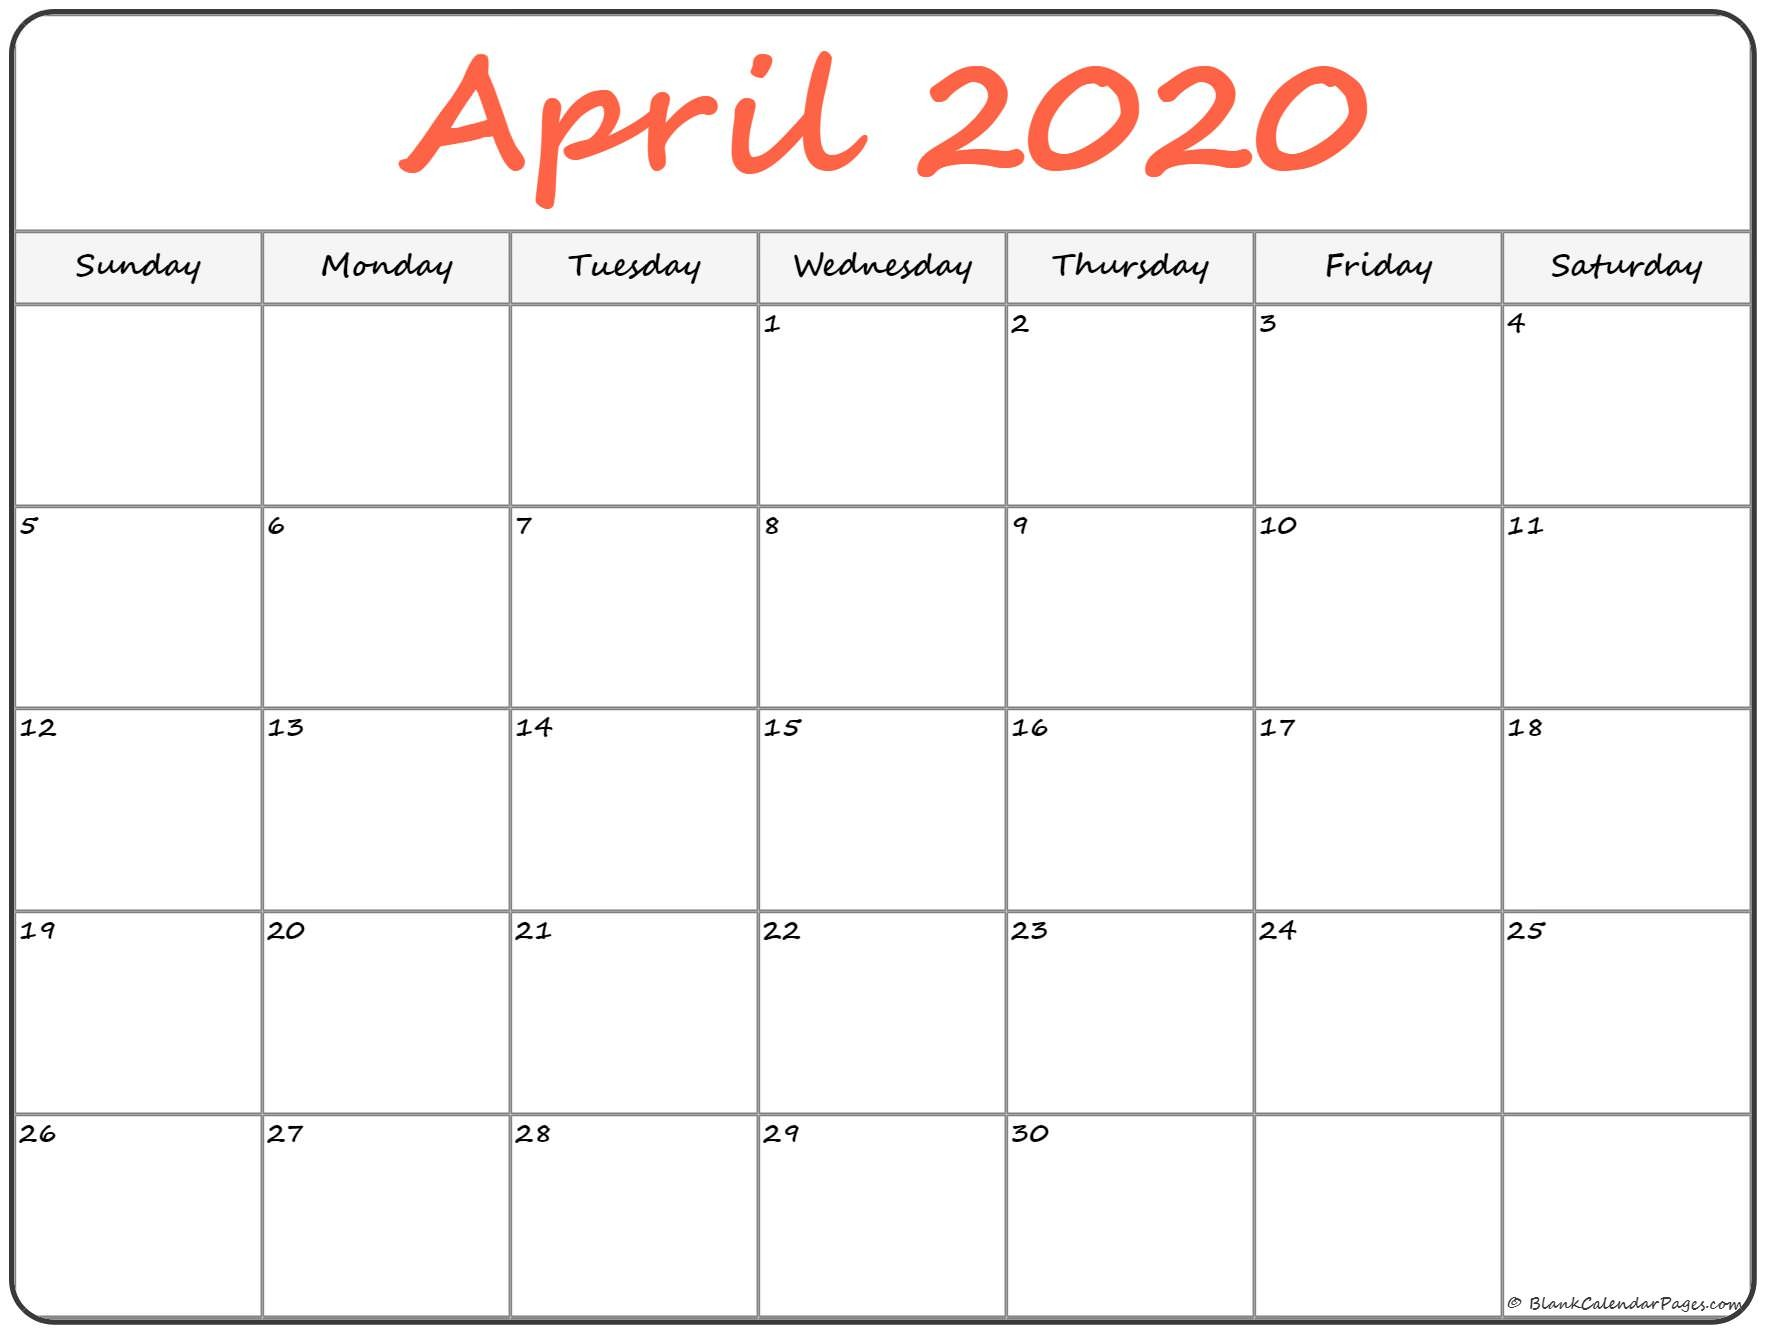 April 2020 Printable Calendar April 2020 Free Printable Blank Calendar Collection